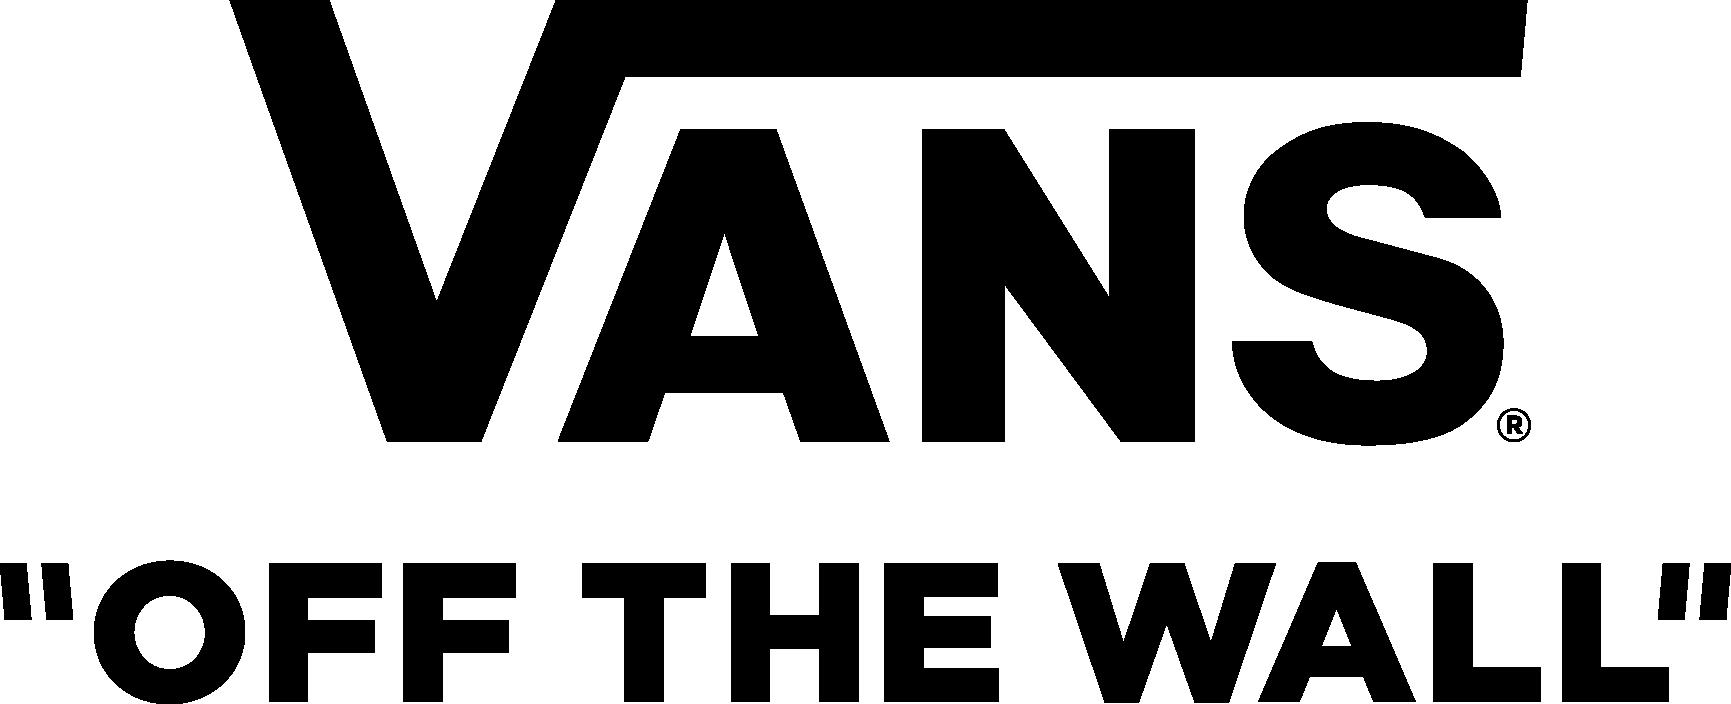 VANS_CMYK_SINGLE_COLOR_REDUCED_LOCKUP_BLACK_4C_CS6.png